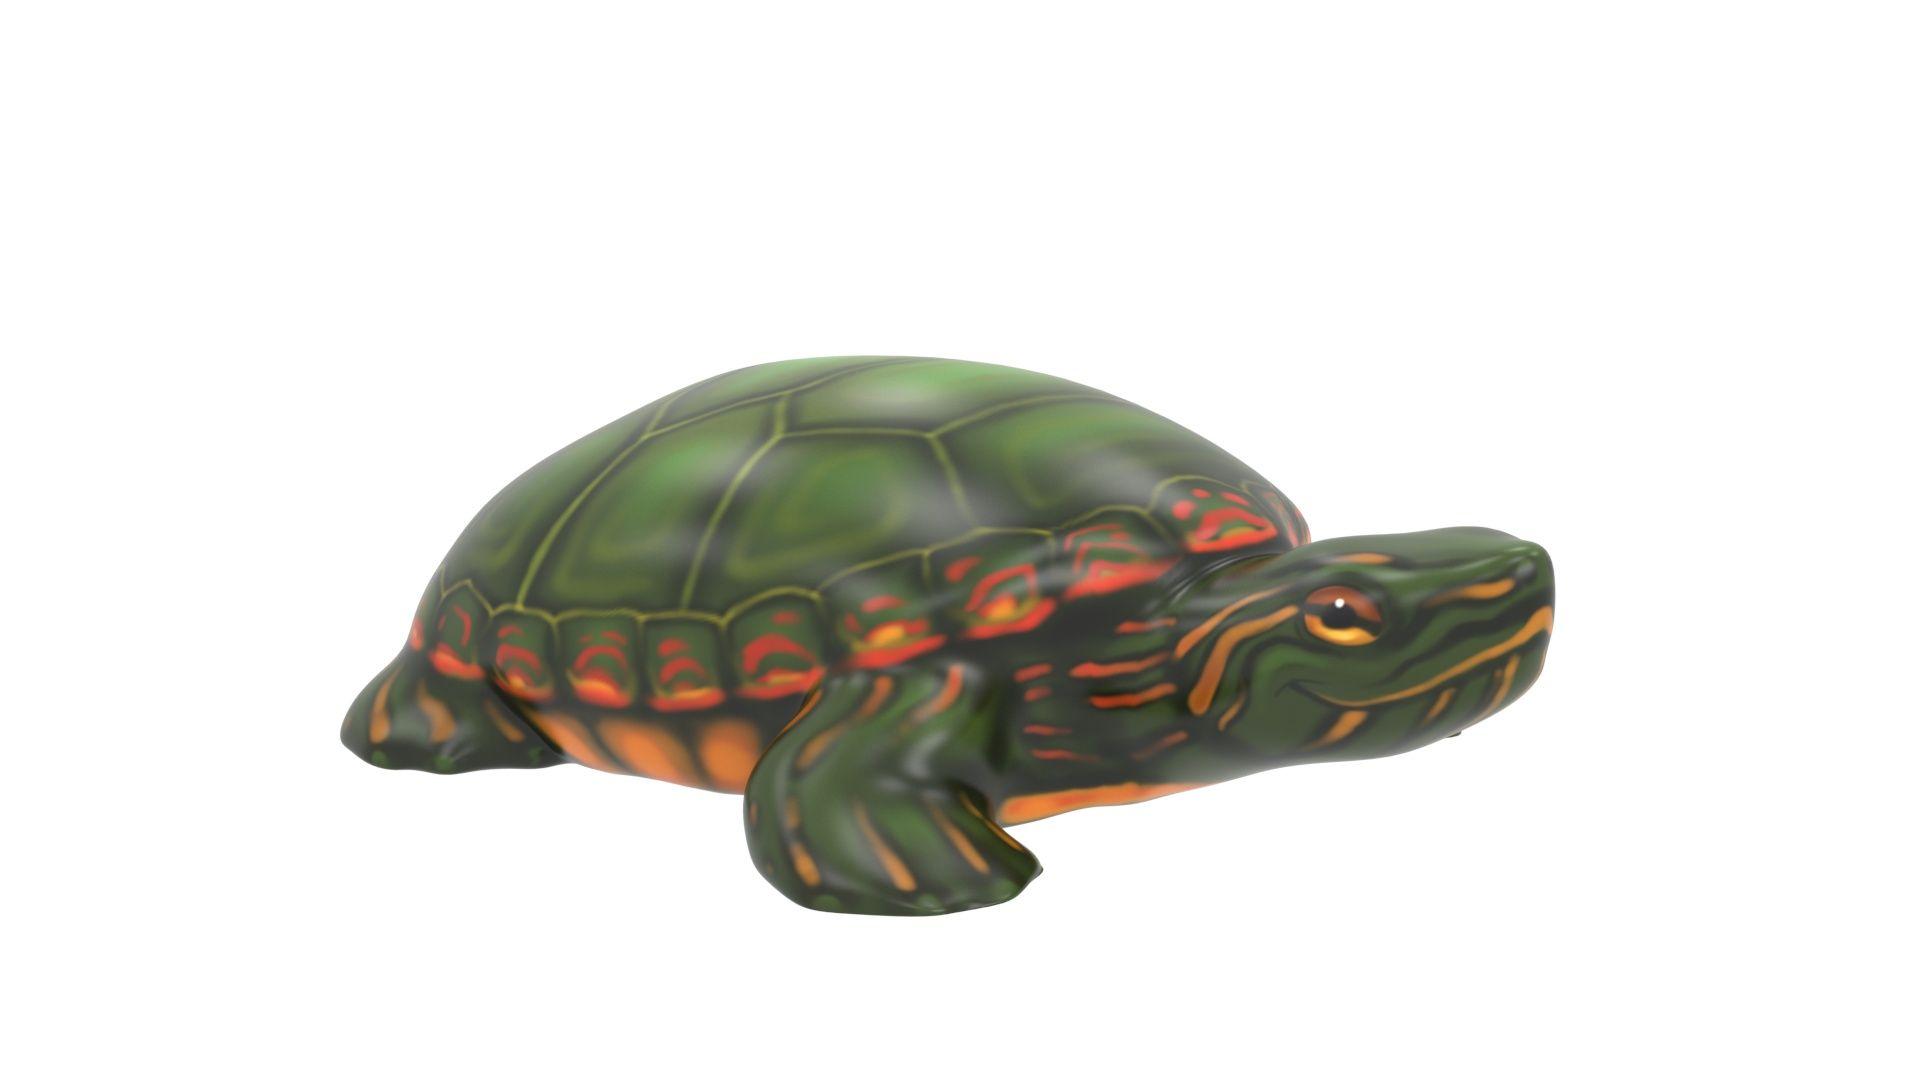 Tucson Turtle Climber (MRTP2020M)